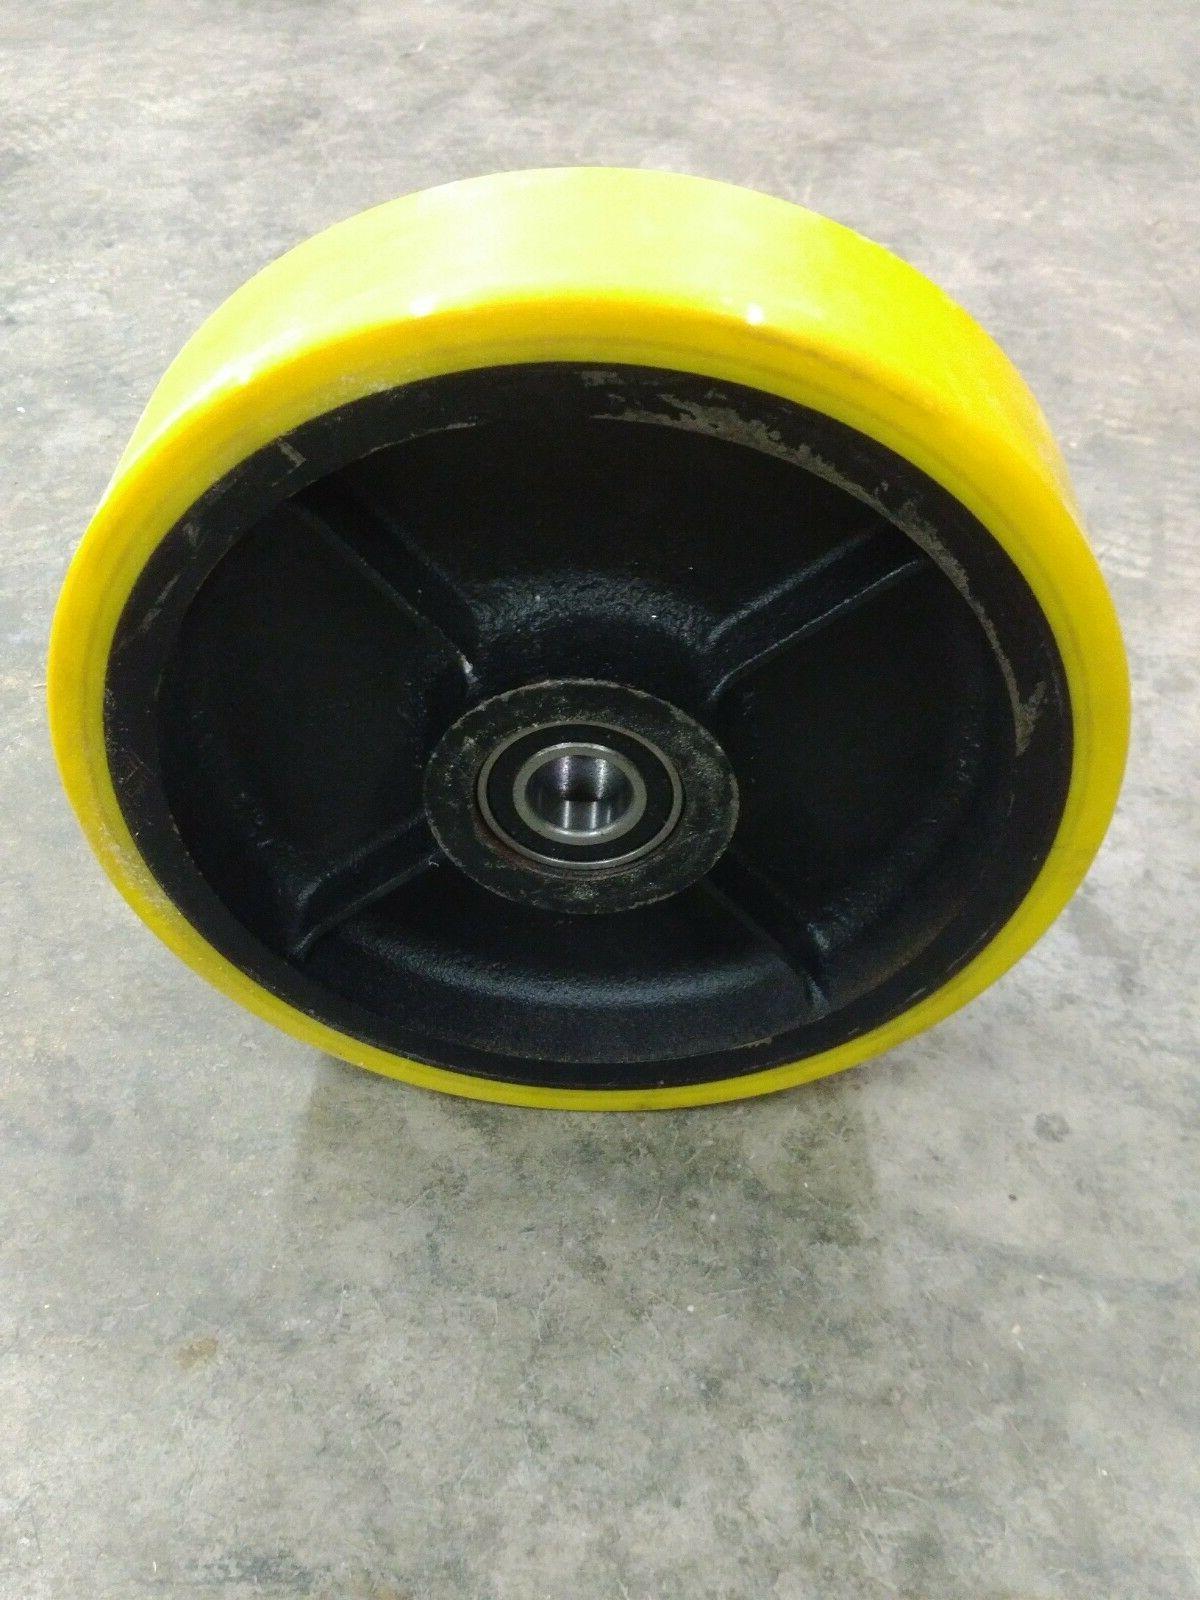 Albion Heavy Caster Polyurethane lb